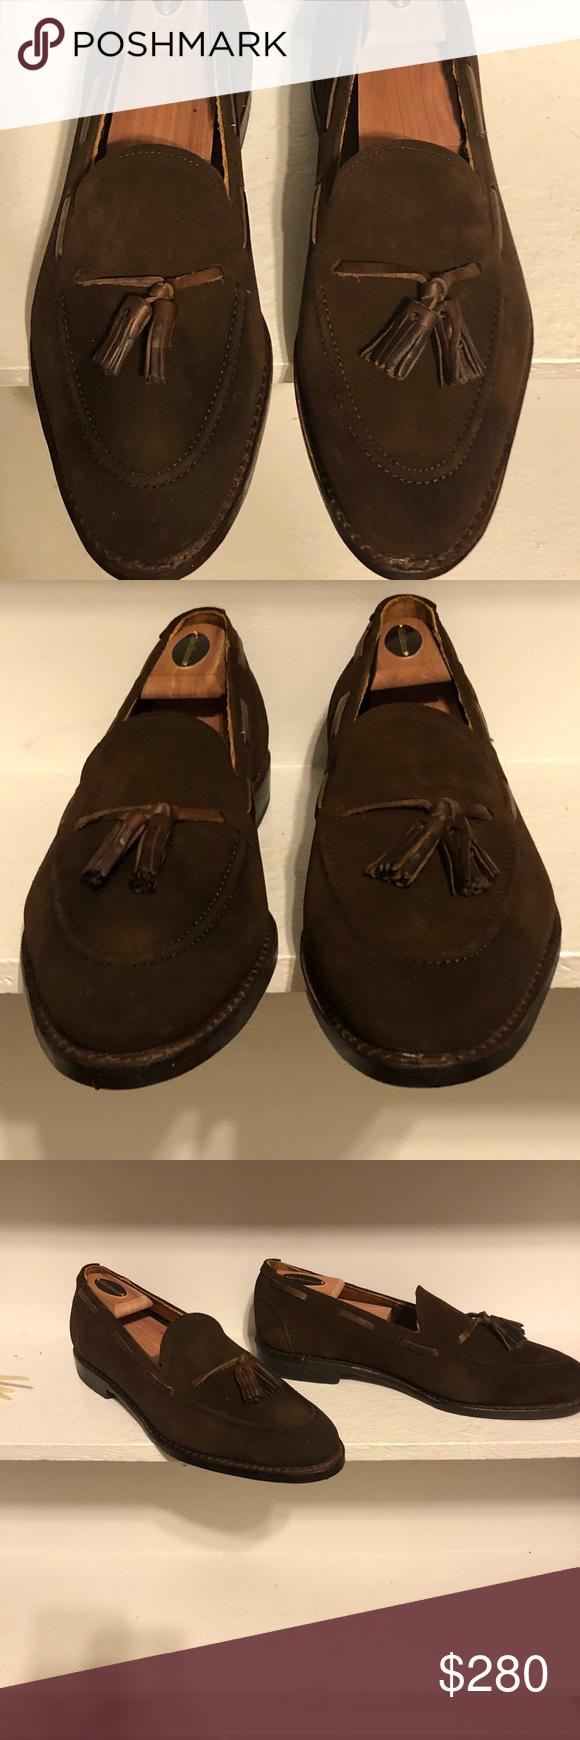 Suede loafers, Suede, Allen edmonds shoes